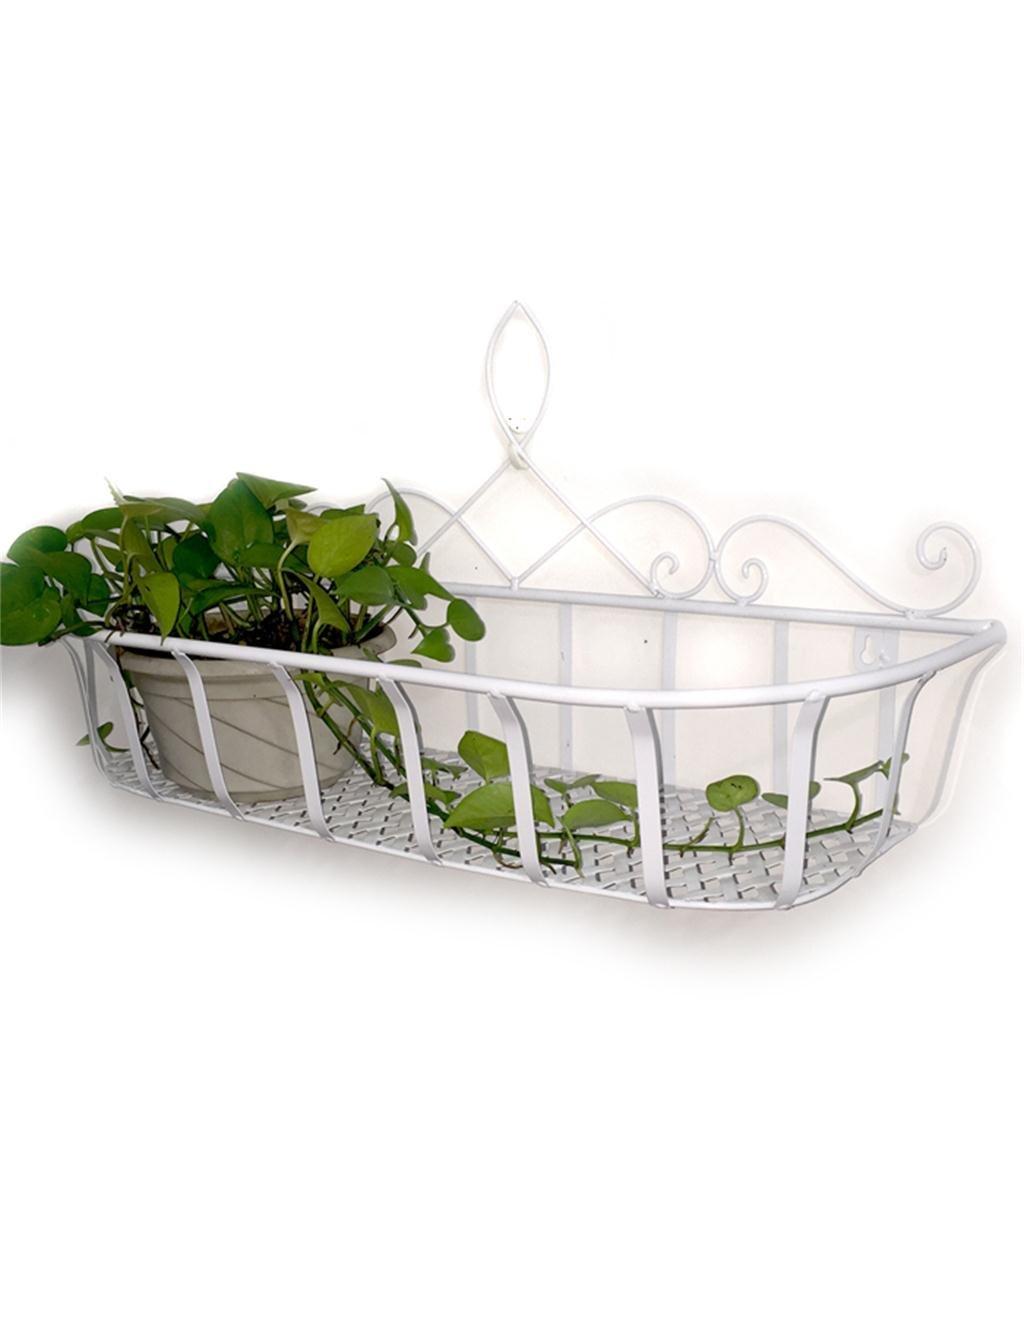 XYZ Continental Iron Wandbehang Flower Pot Regal, Balkon Blumenregal, Dekorative Pflanze Regal Empfindlich haltbar ( farbe : Weiß , größe : L )